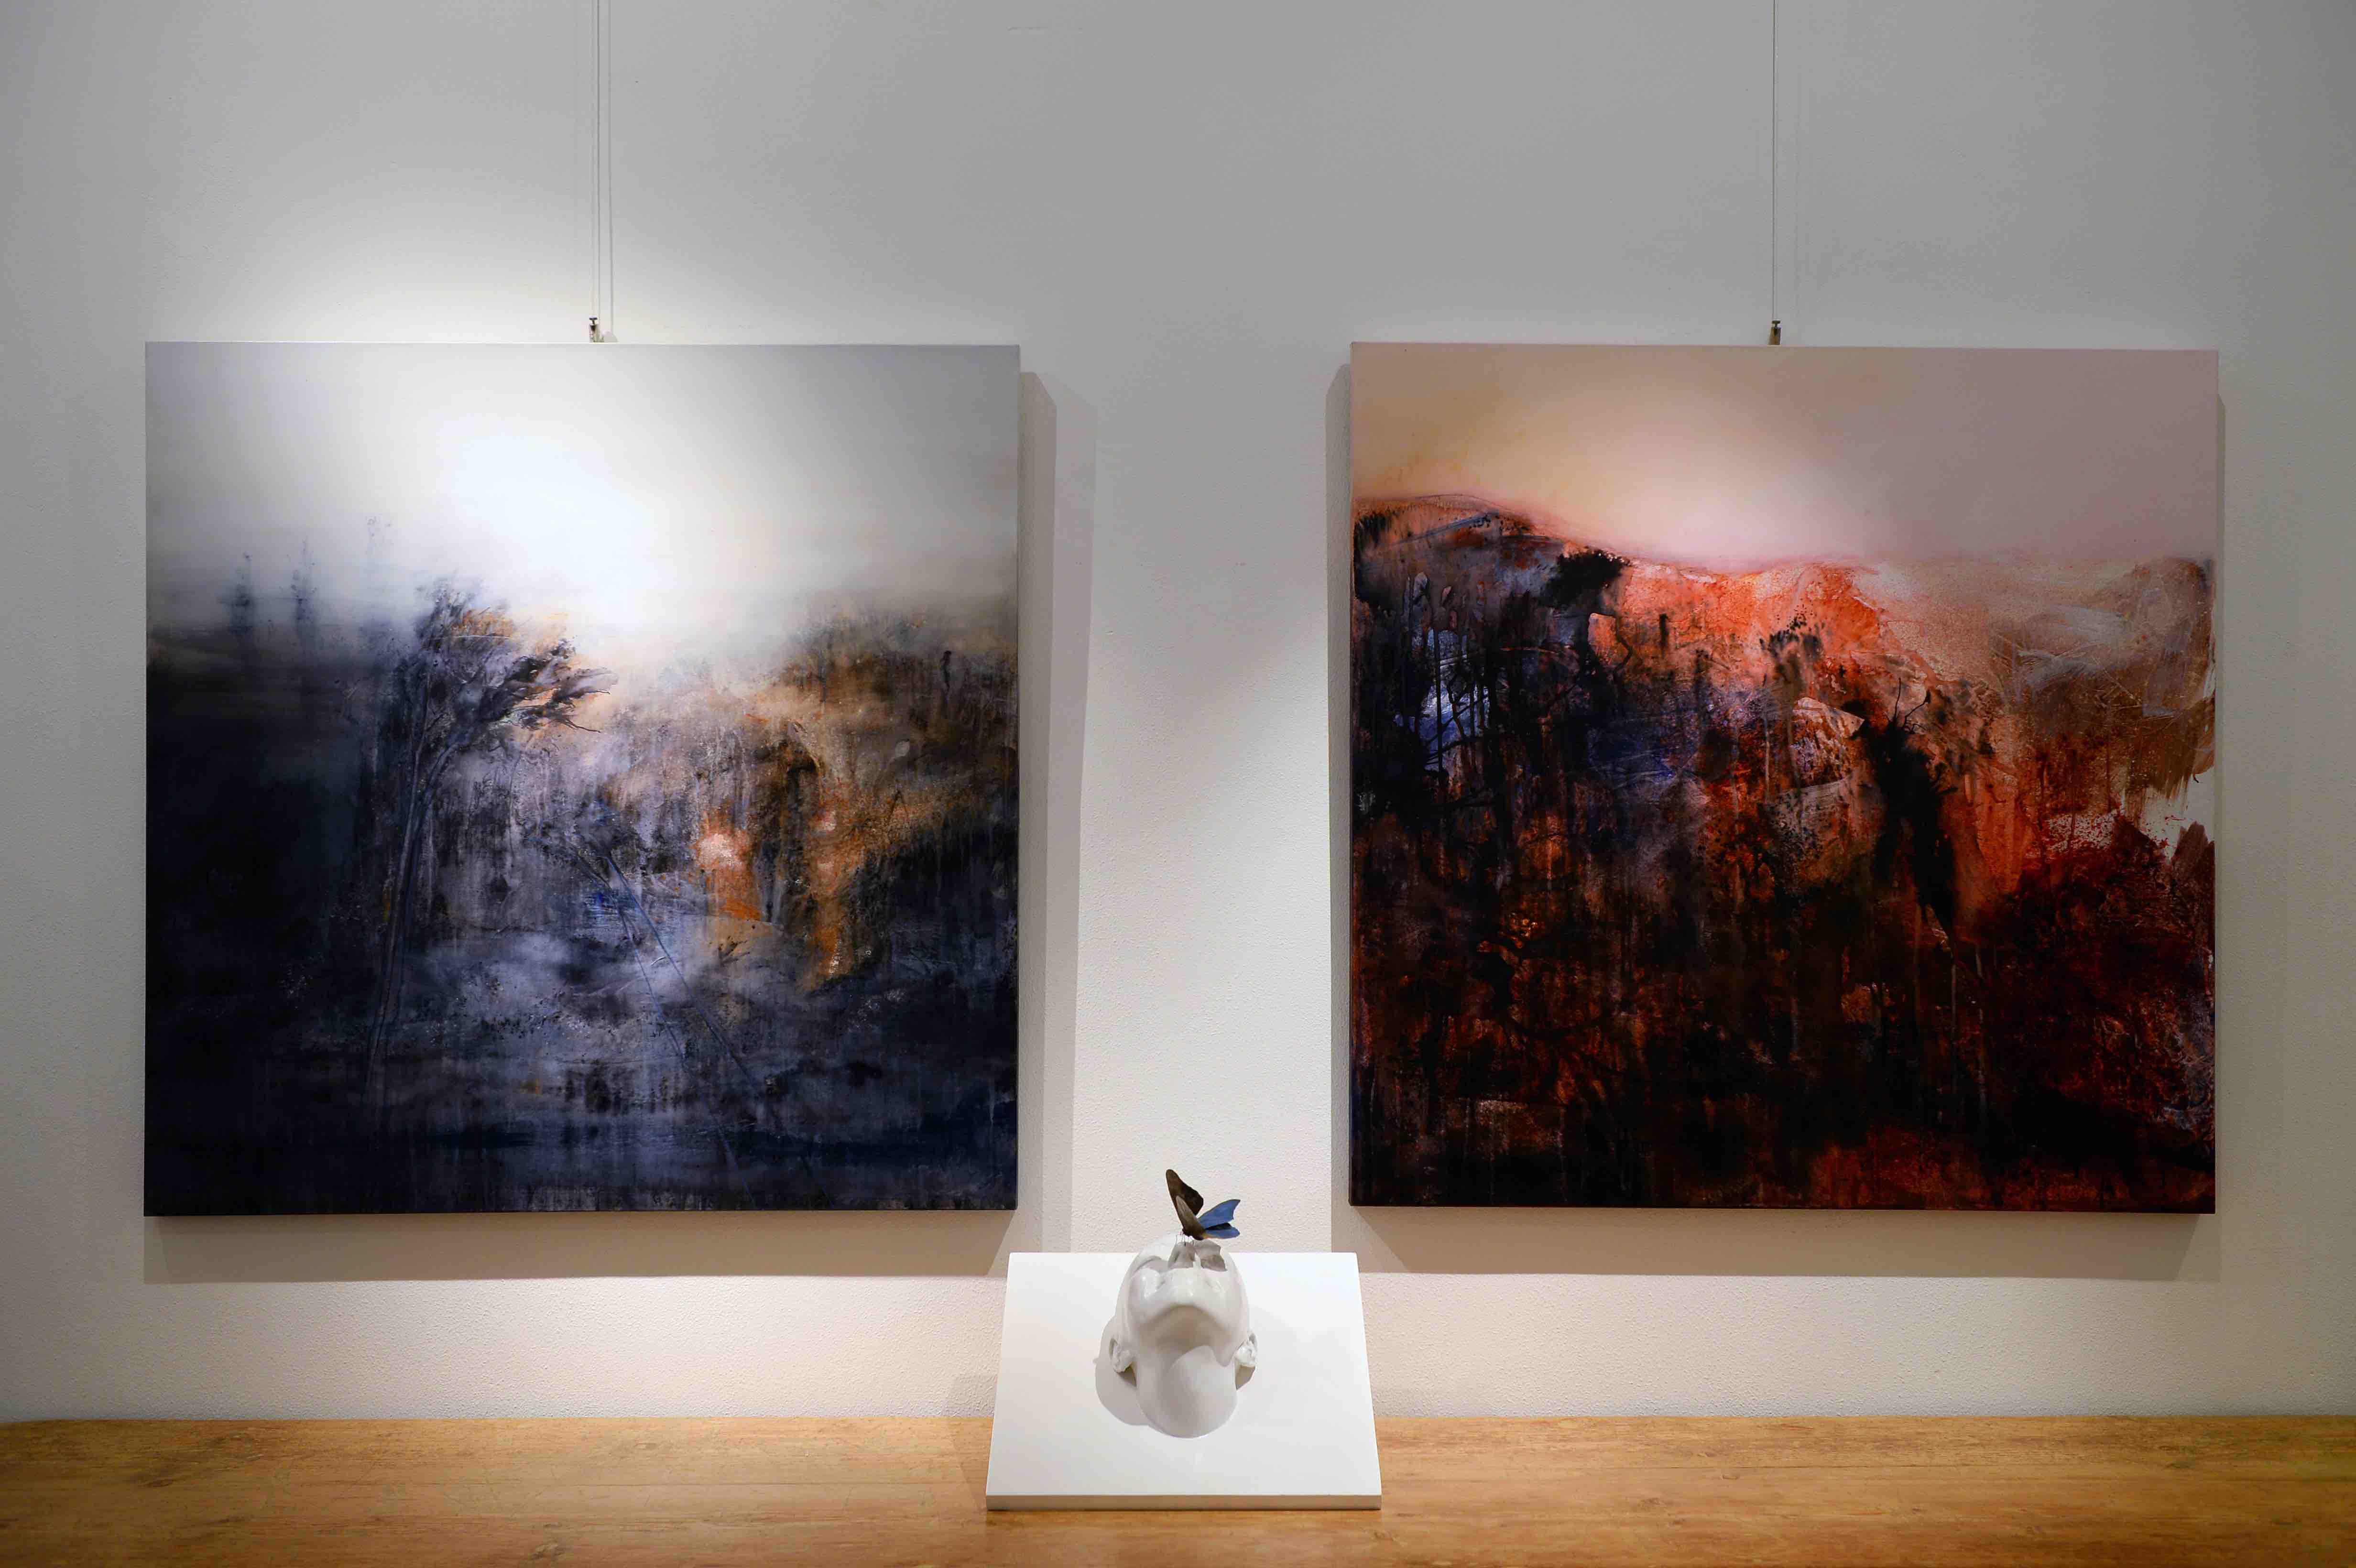 Kristina Milakovich, Fabio Imperiale, RvB Arts